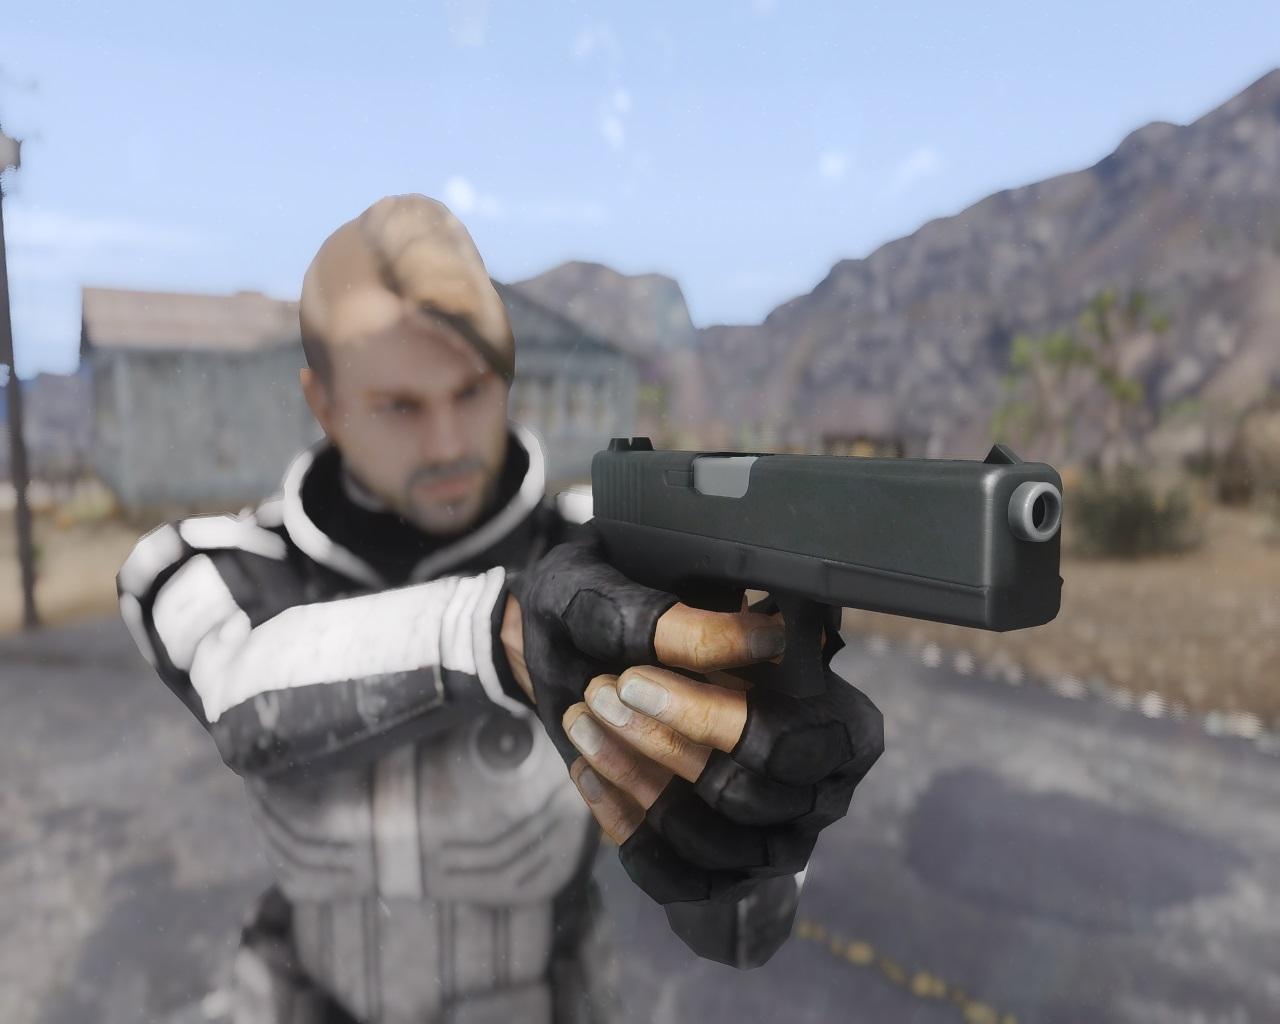 Glock 17 для Fallout New Vegas для Fallout: New Vegas - Скриншот 3